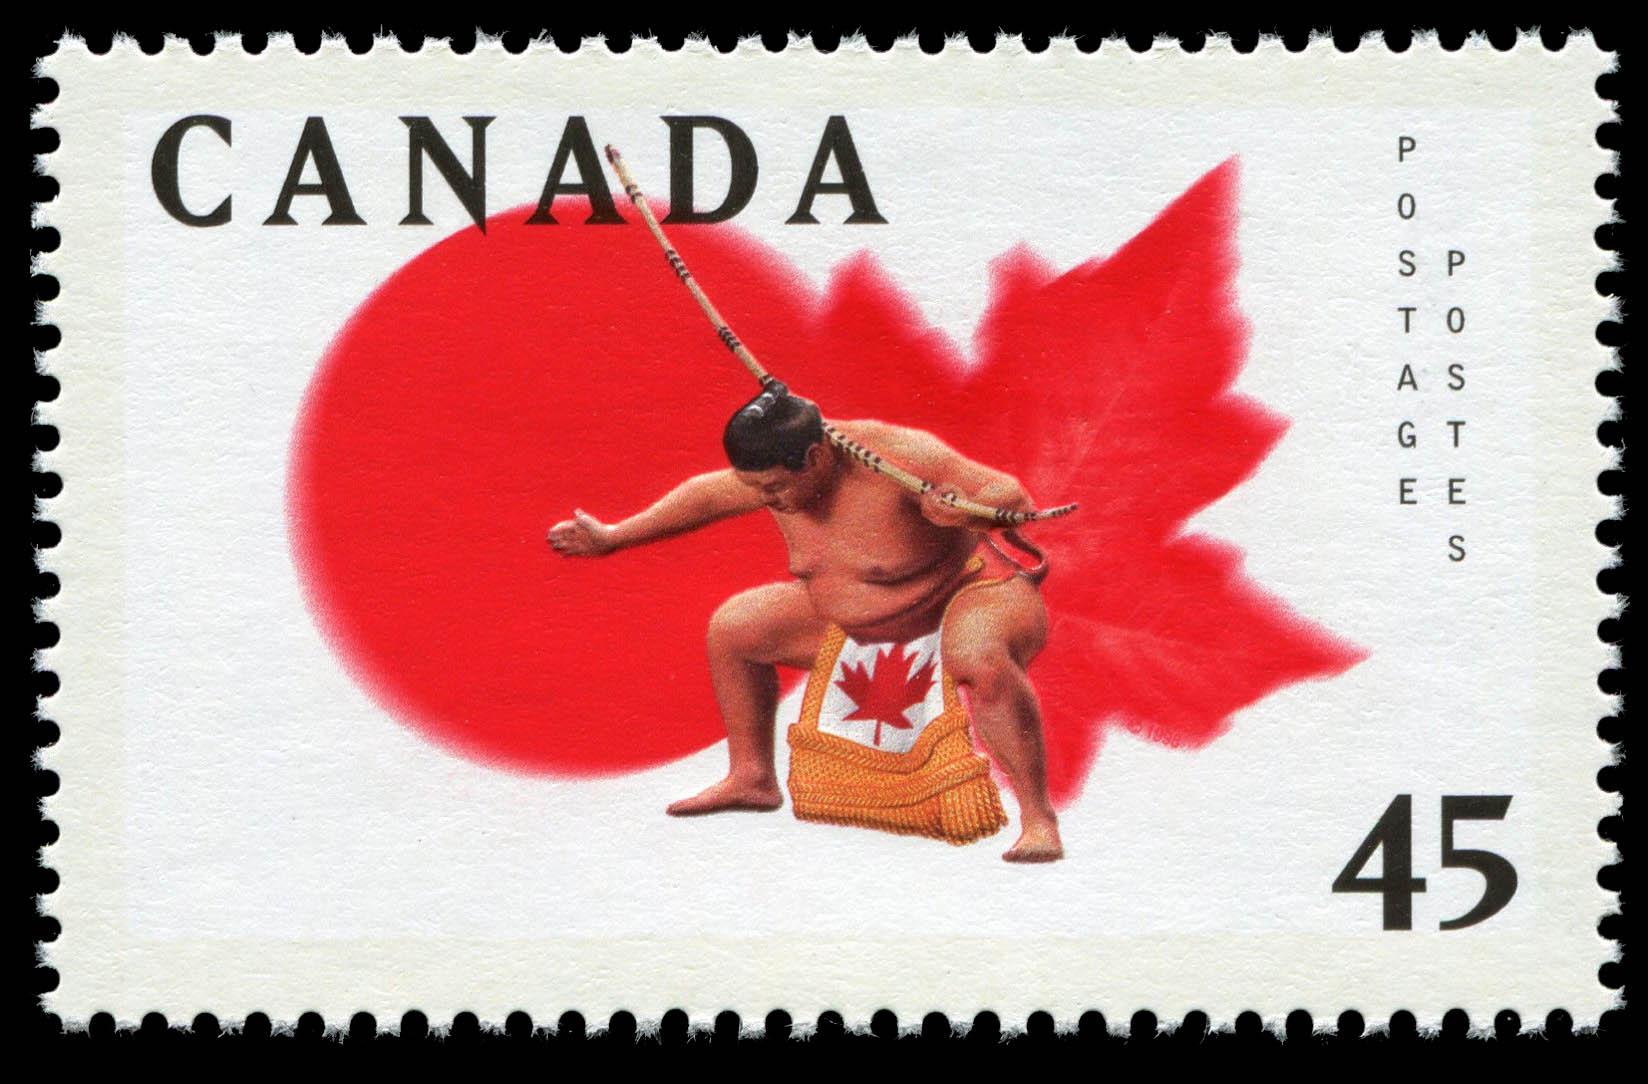 Sumo Wrestling Ceremony Canada Postage Stamp